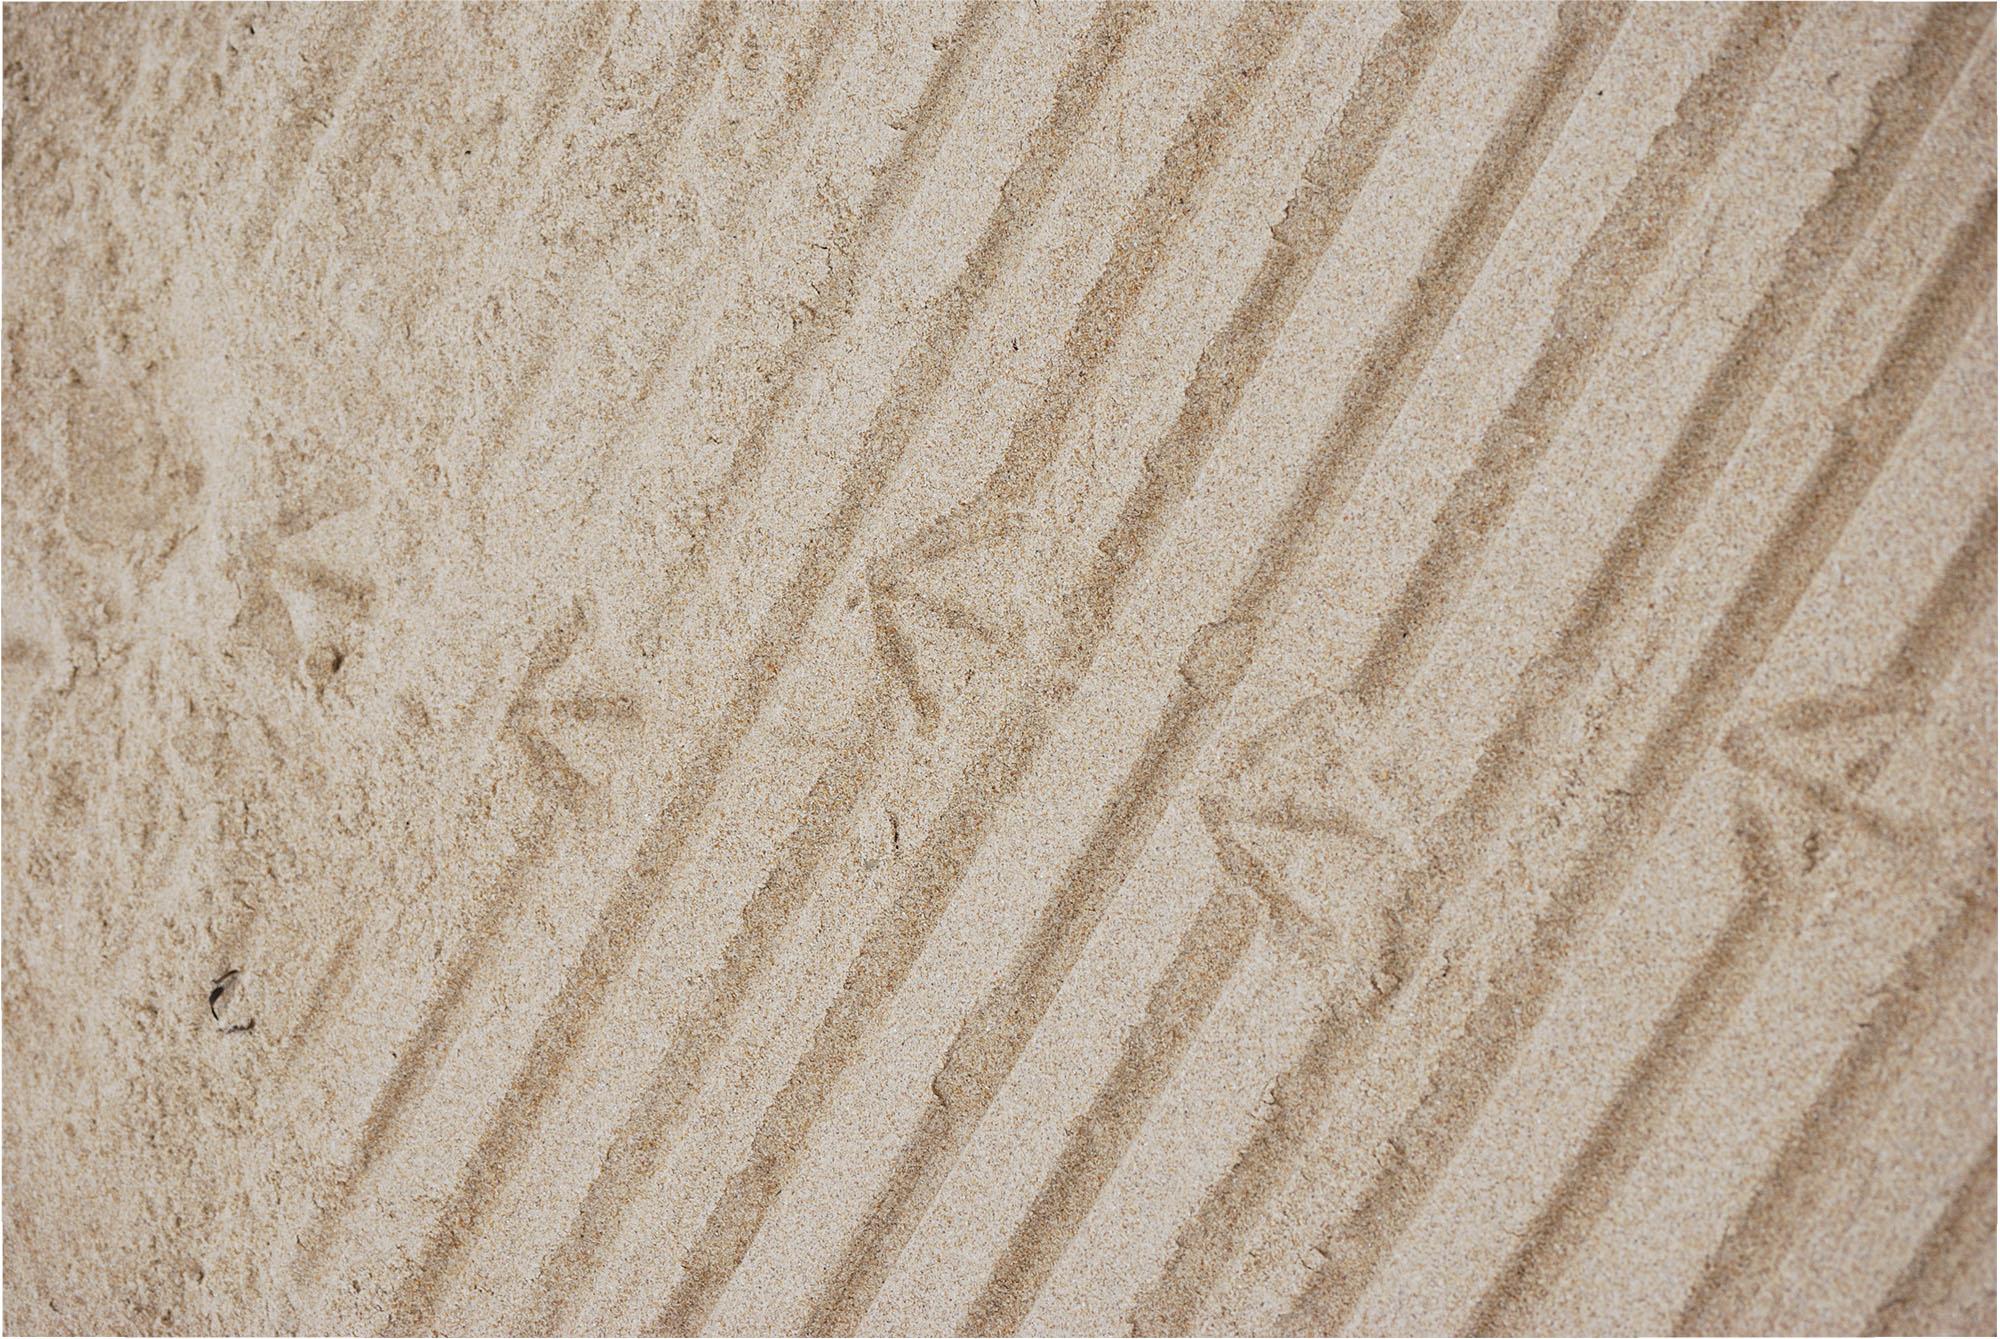 seagull foot prints